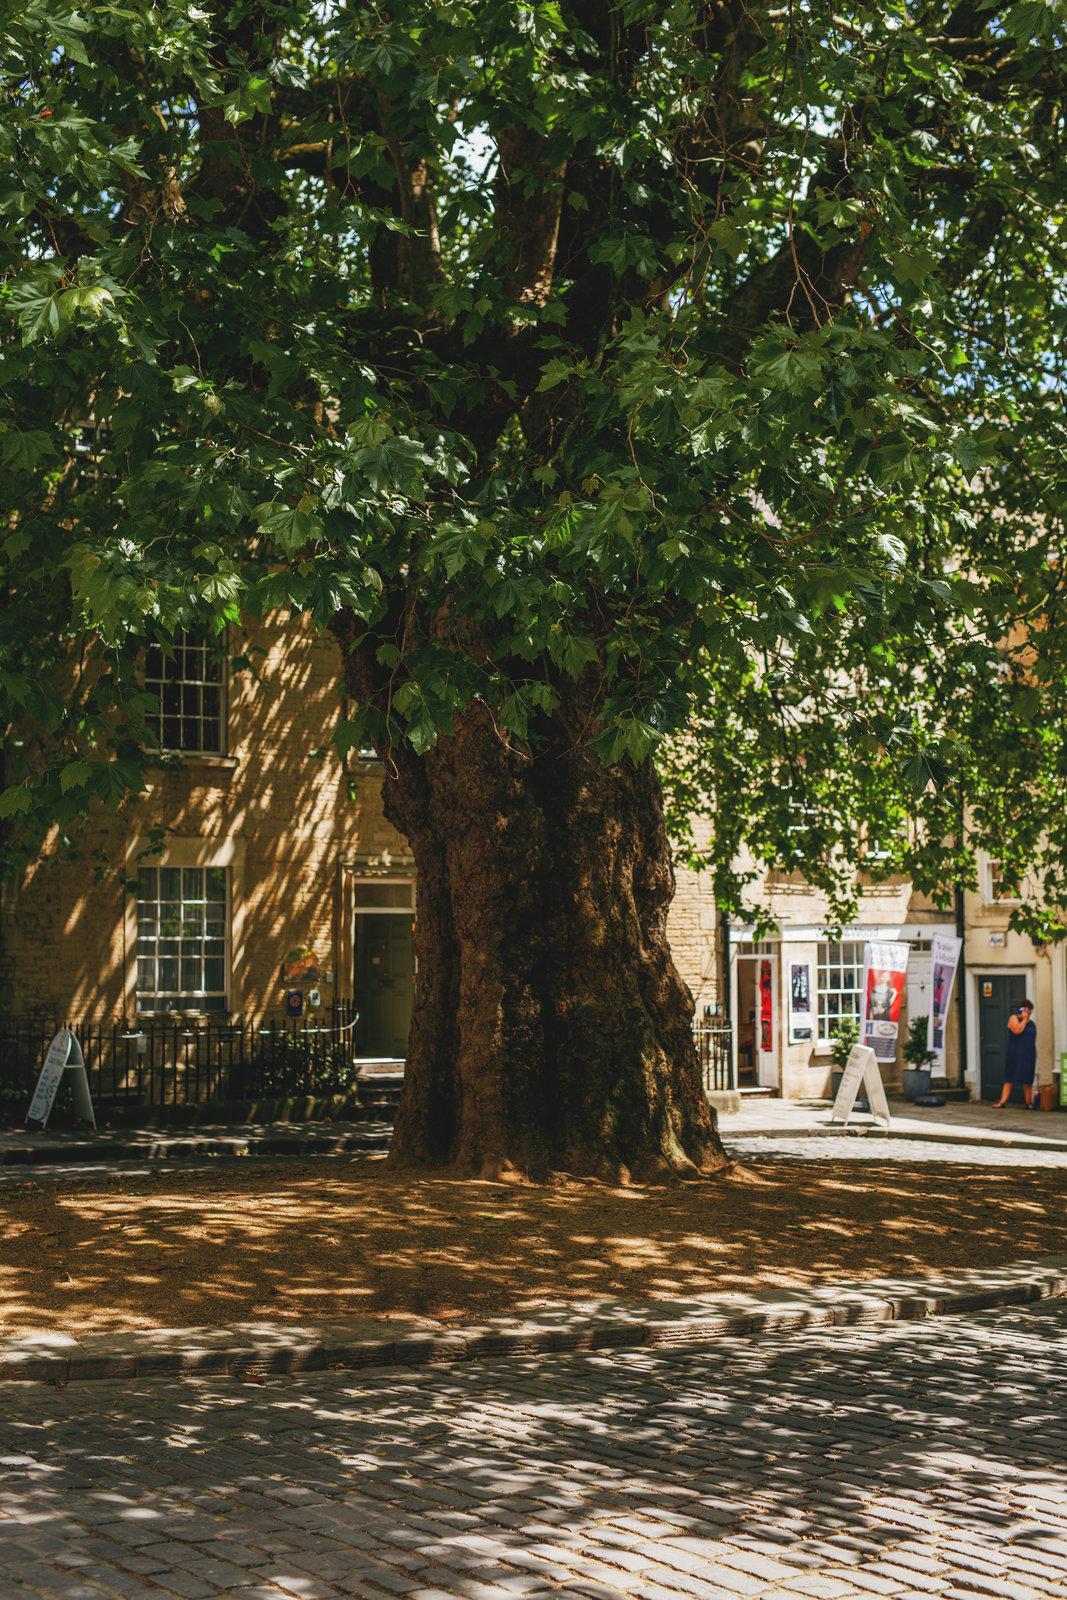 stoletý strom